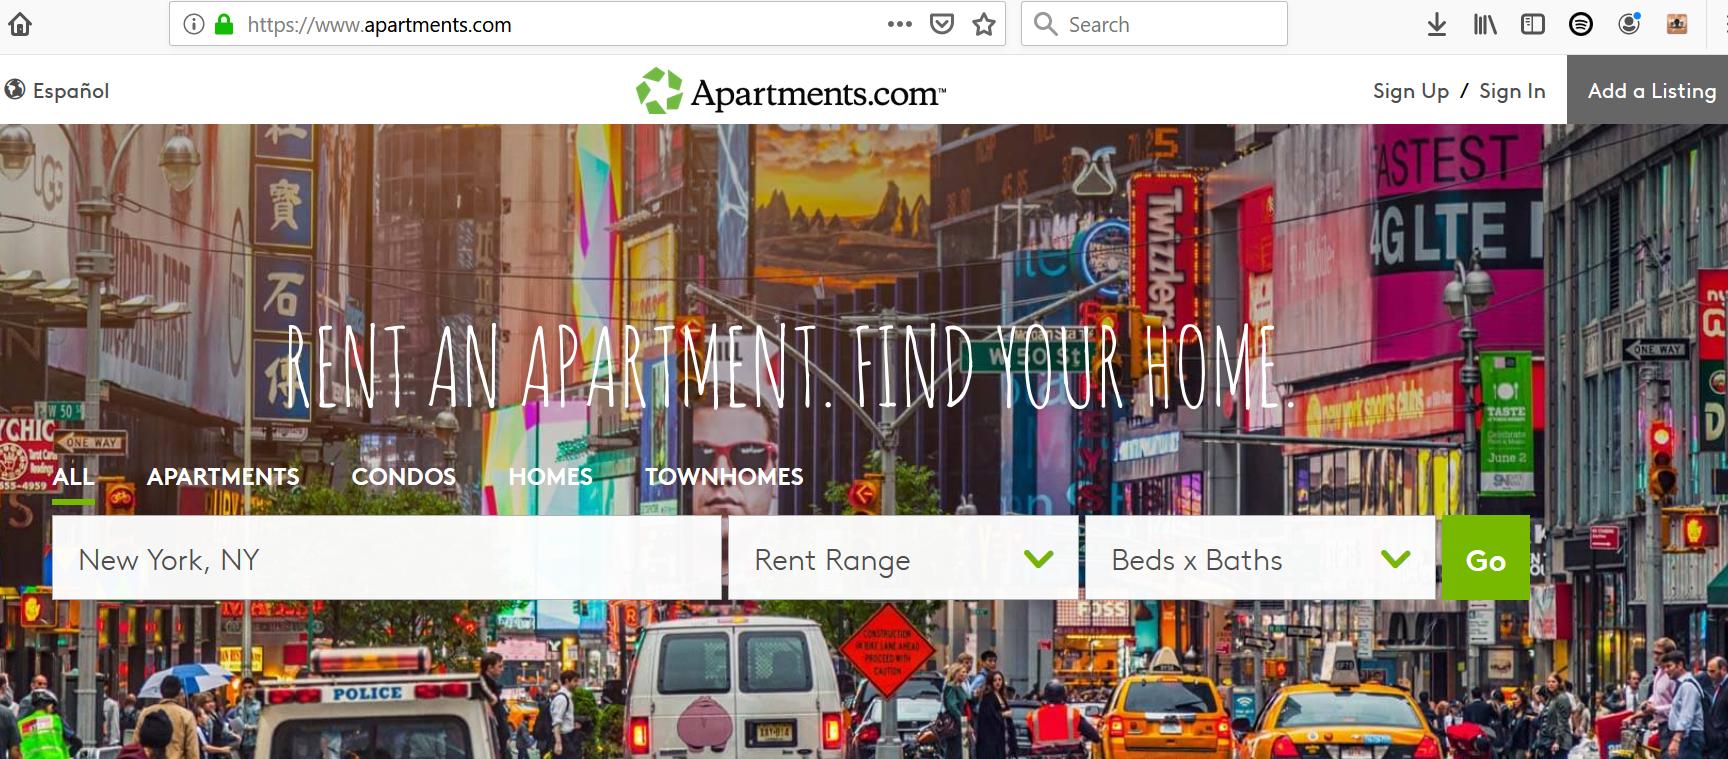 Websites Like Craigslist for Apartments - Apartments.com